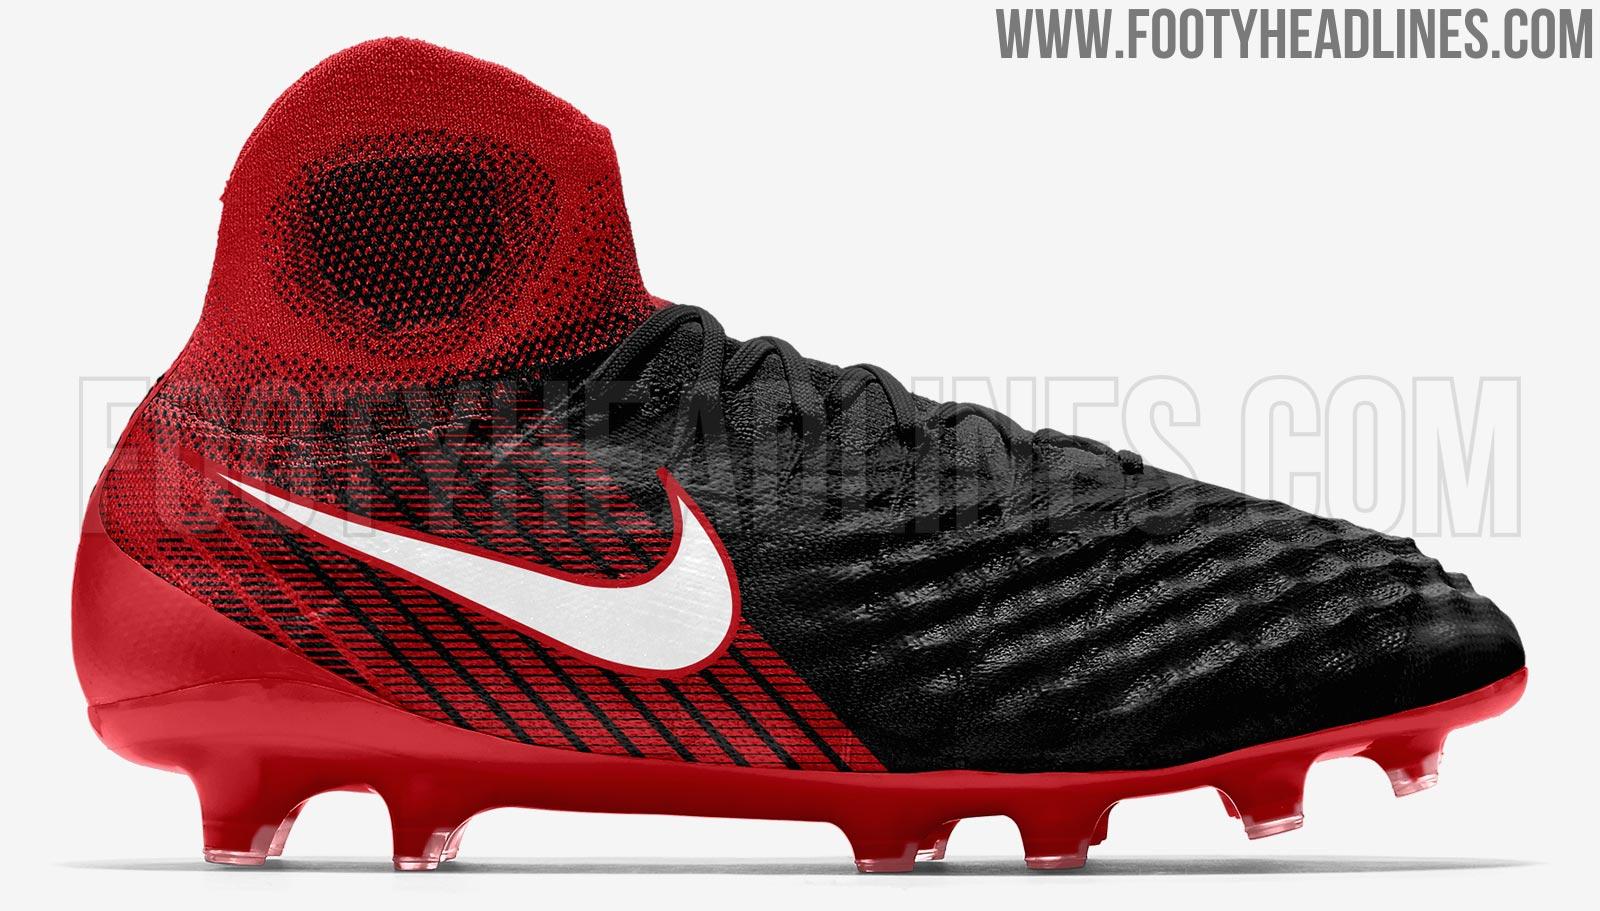 Pack Red Du 20172018 Fuite Exclusif Foot Chaussures Nike De afpn6wxq